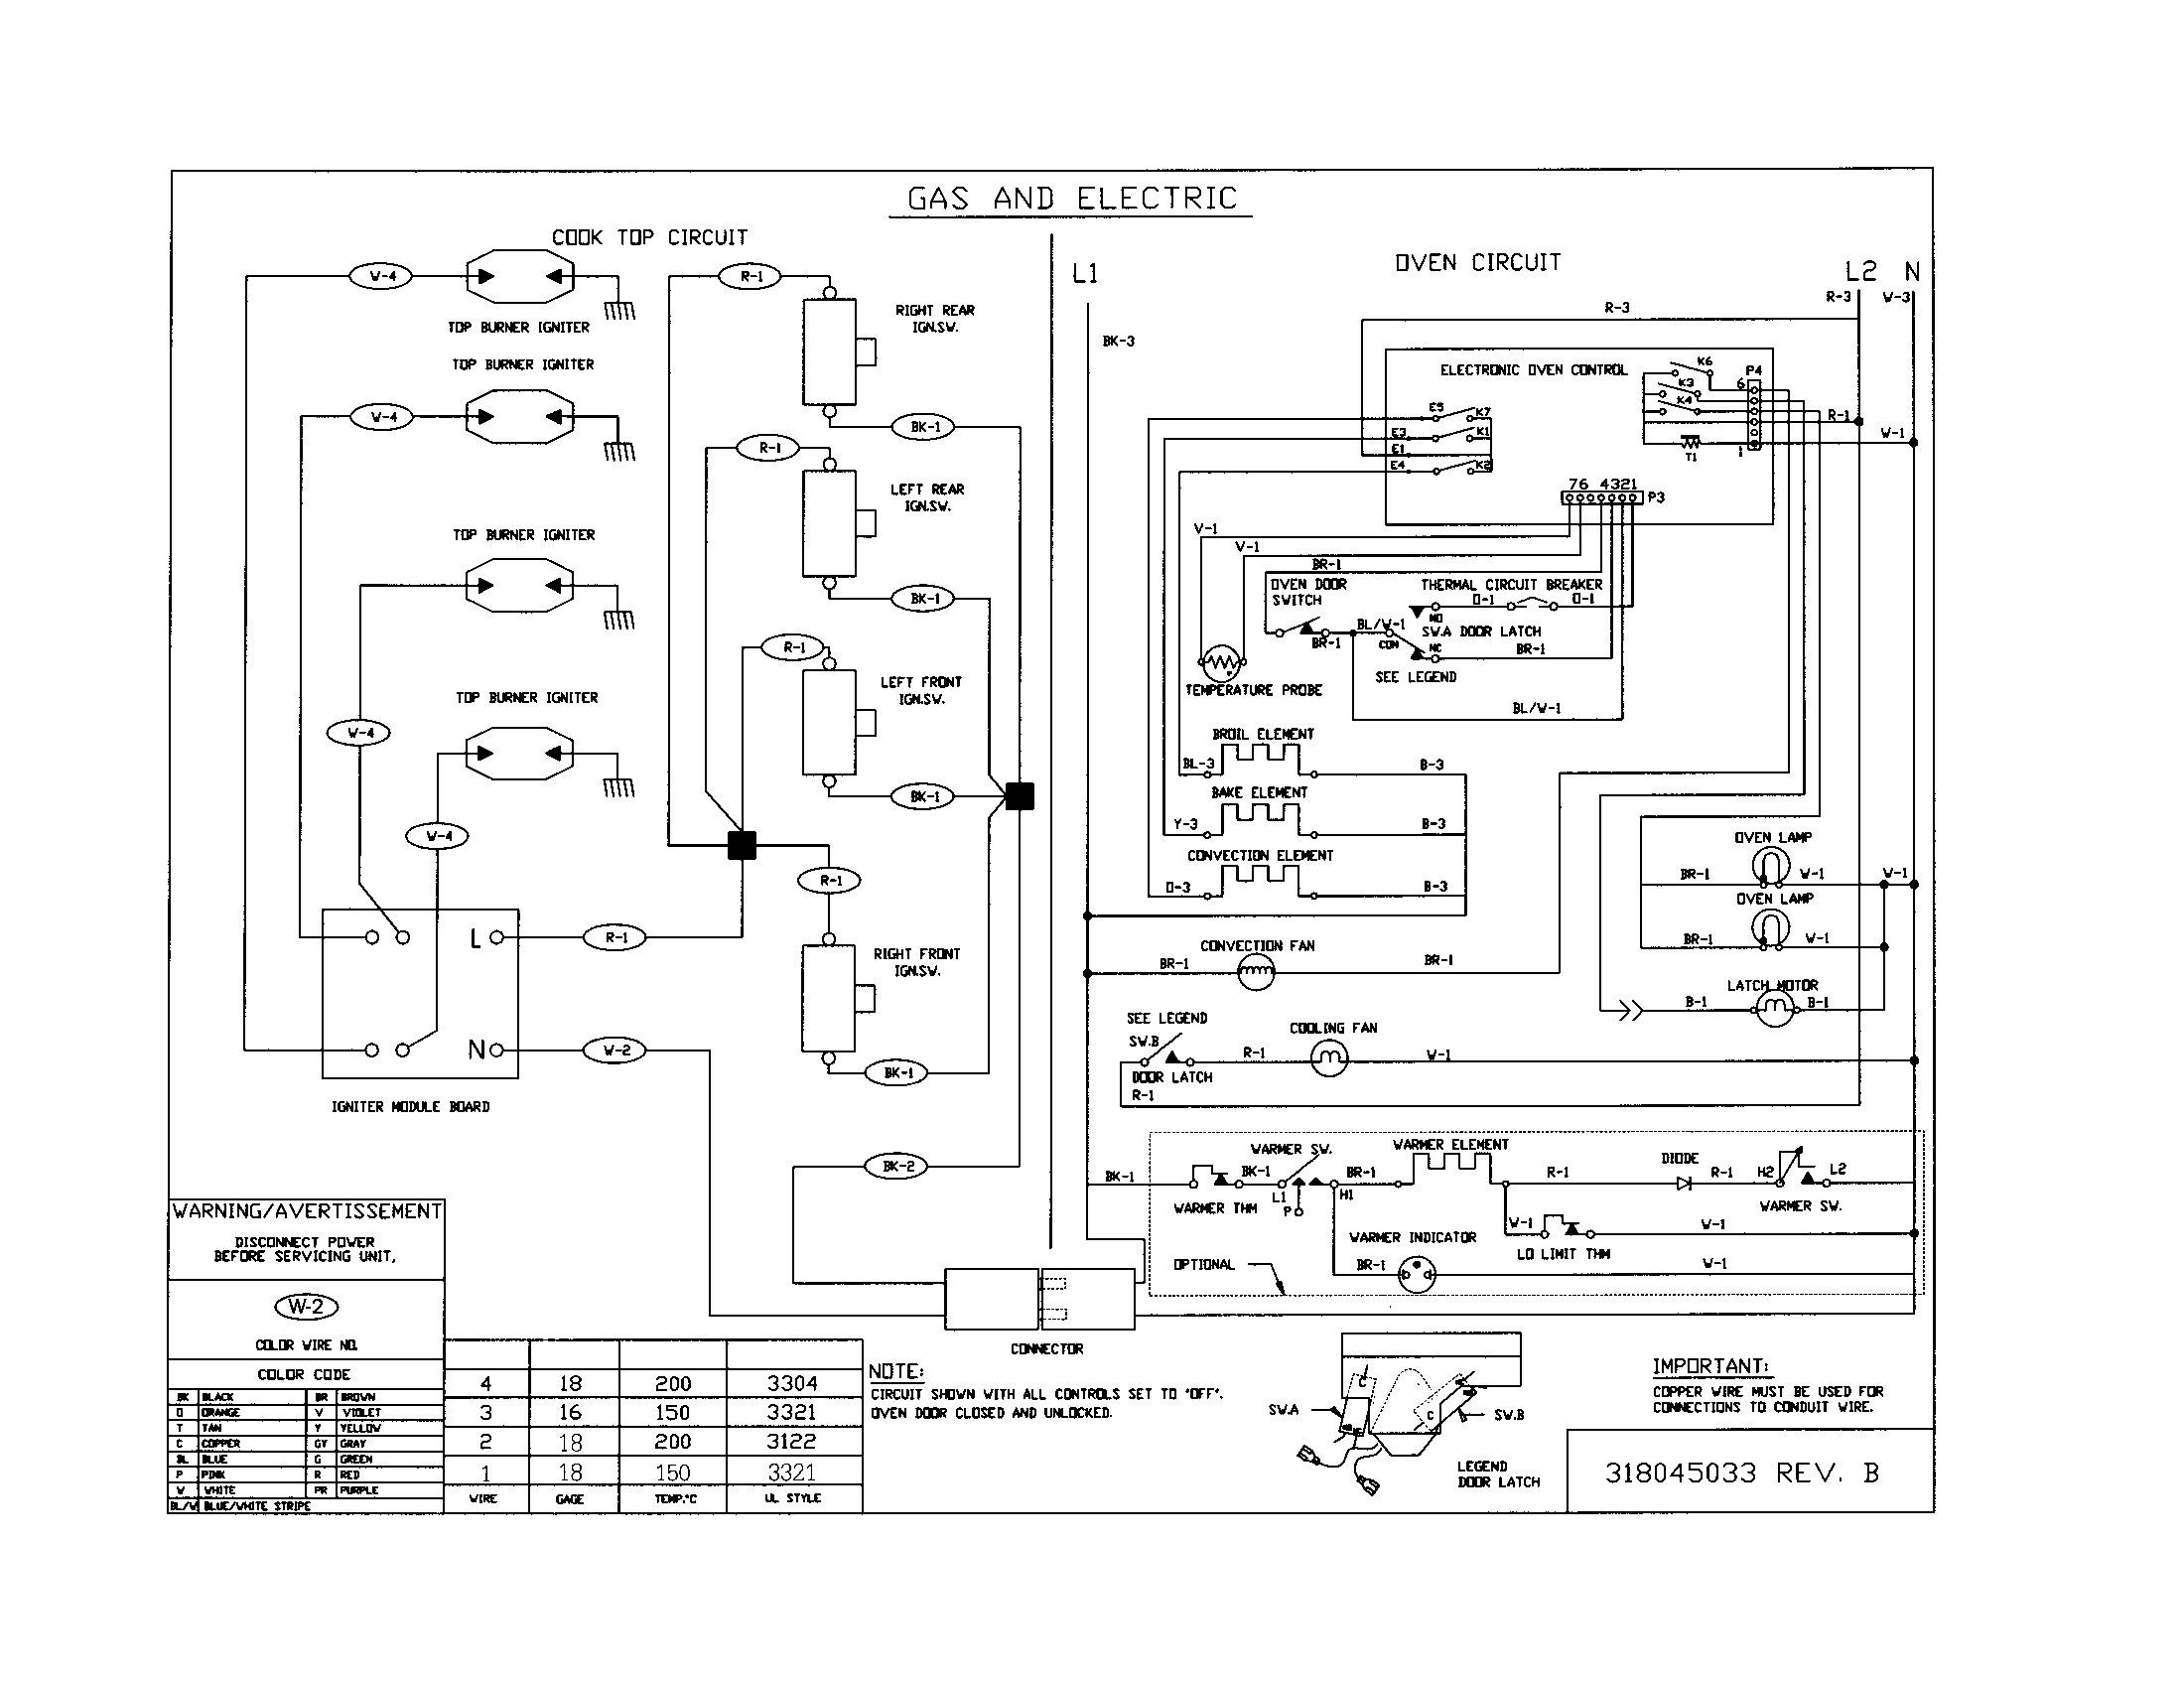 Samsung Dryer Wiring Diagram Ts 5995] Wiring Diagram Appliance Dryer Of Samsung Dryer Wiring Diagram